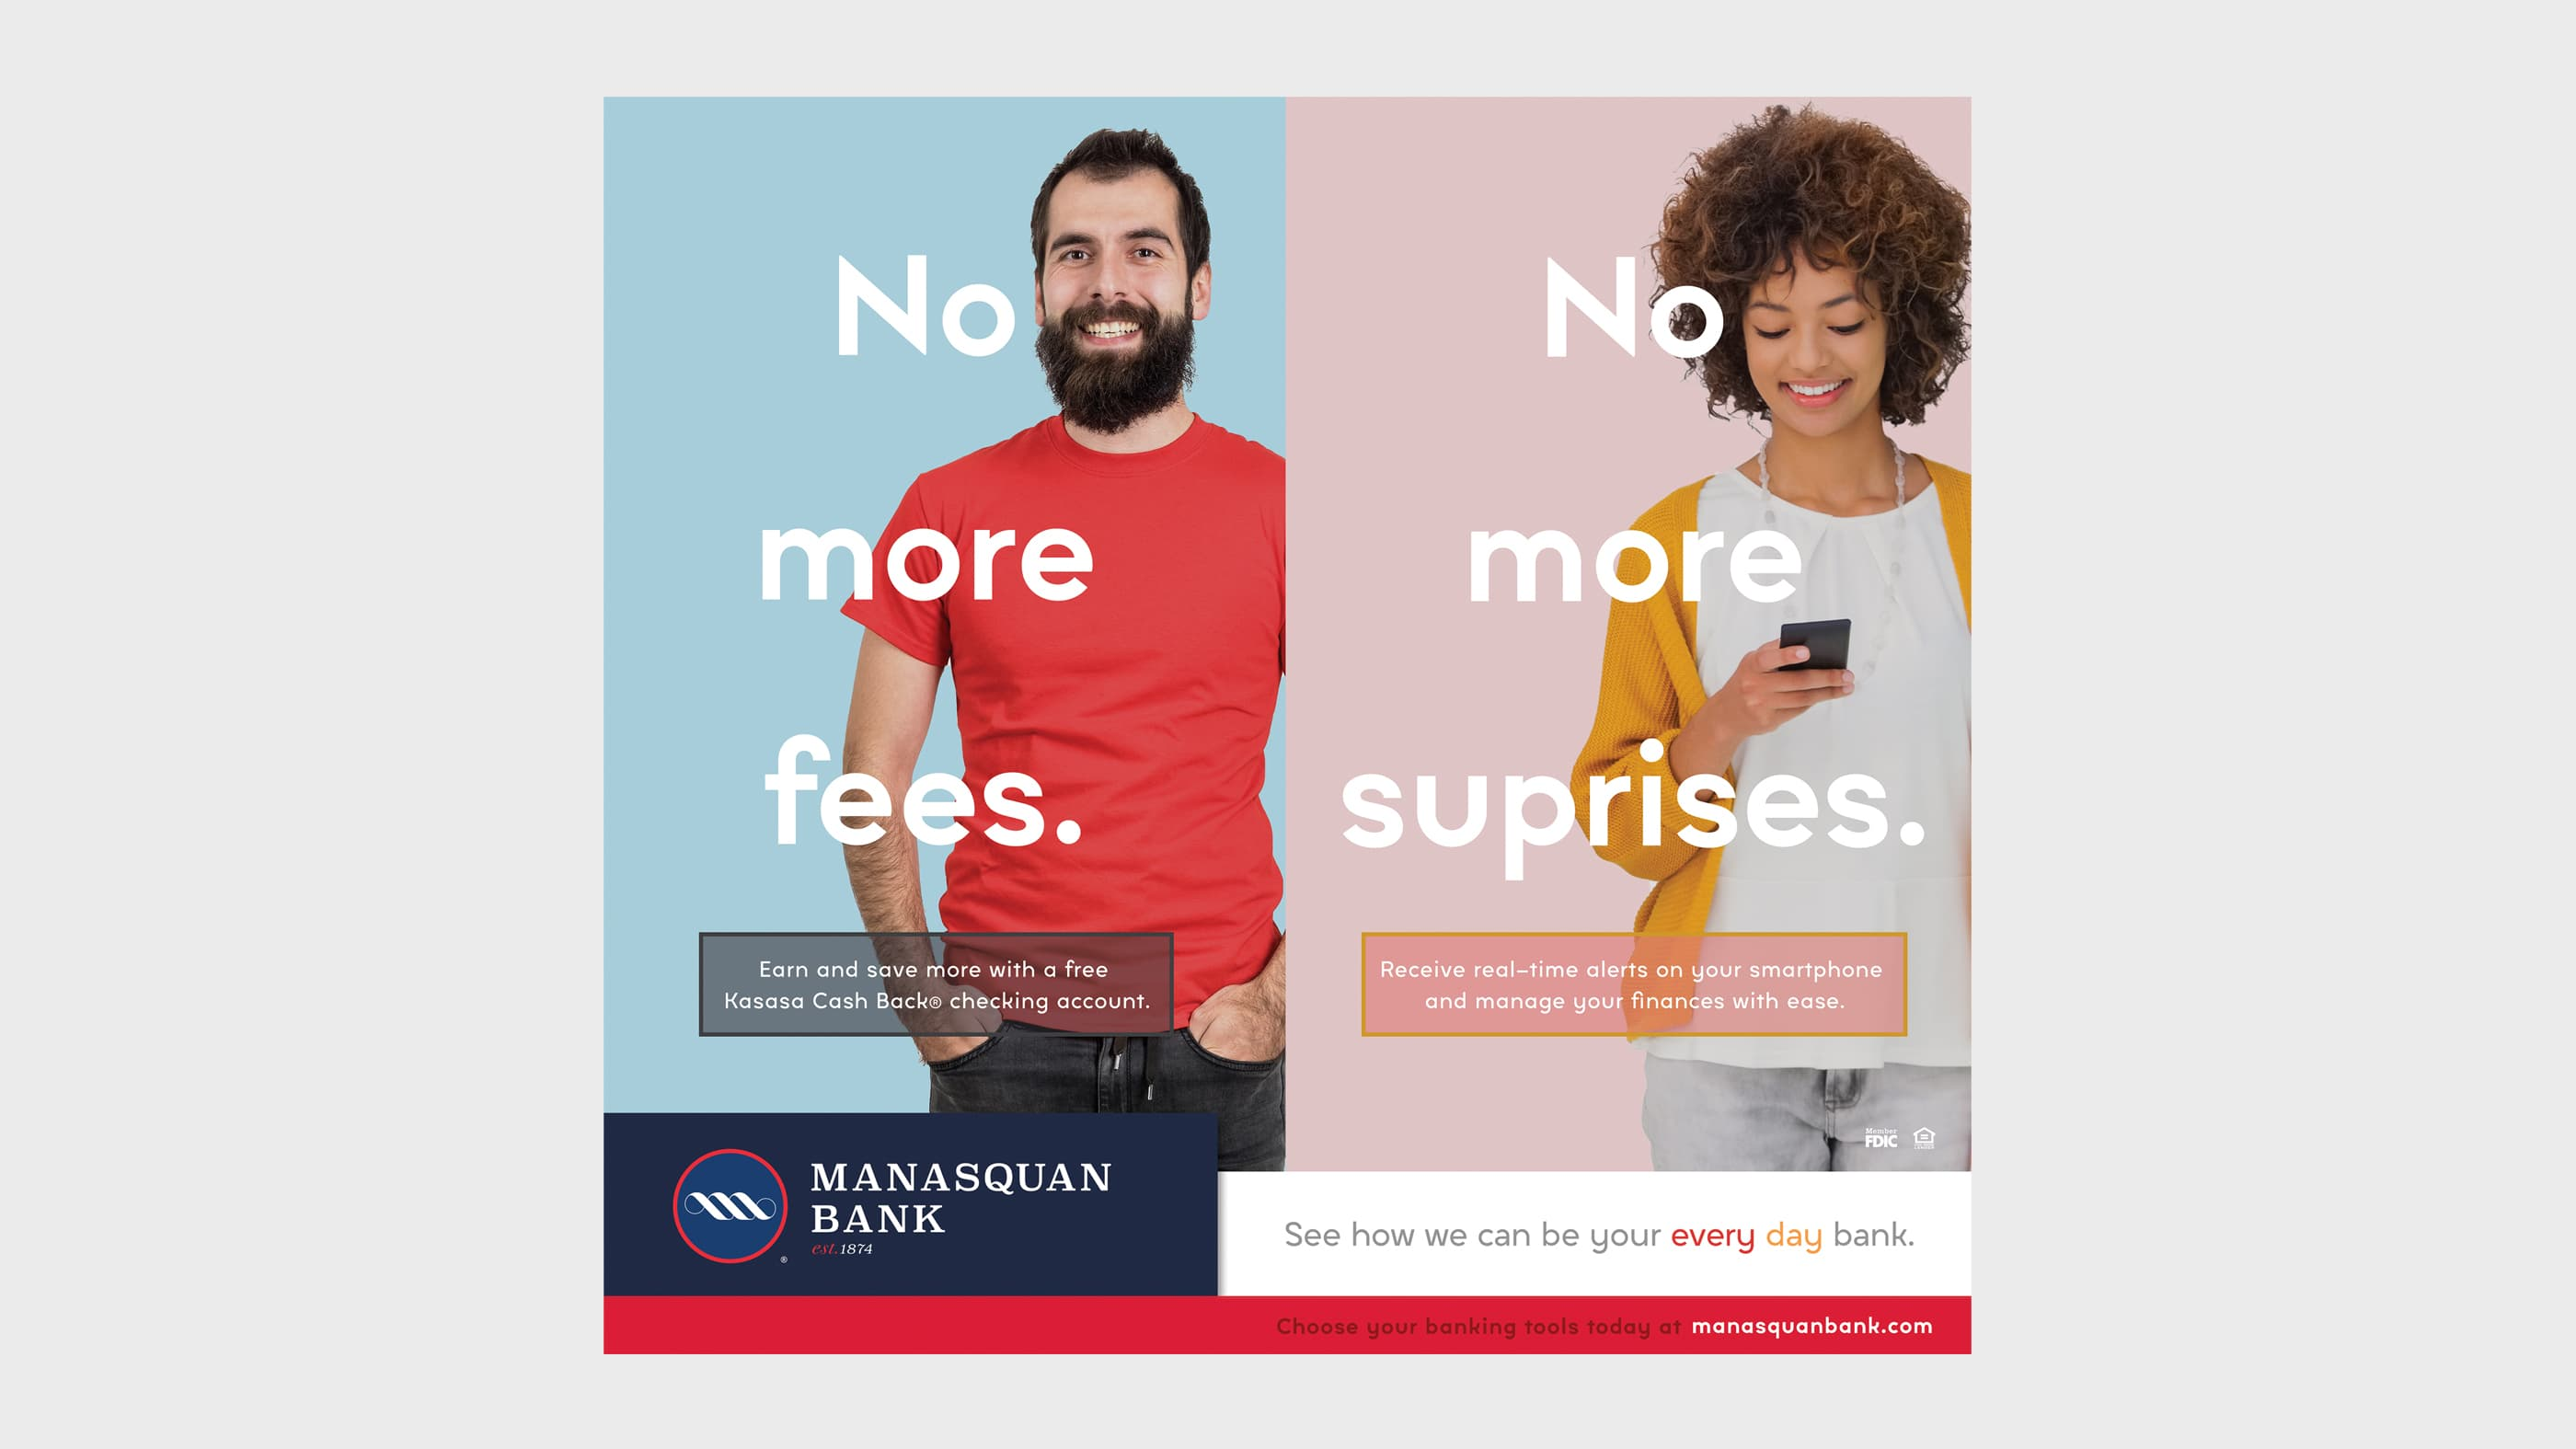 Manasquan Bank Cross Sell Print Advertising